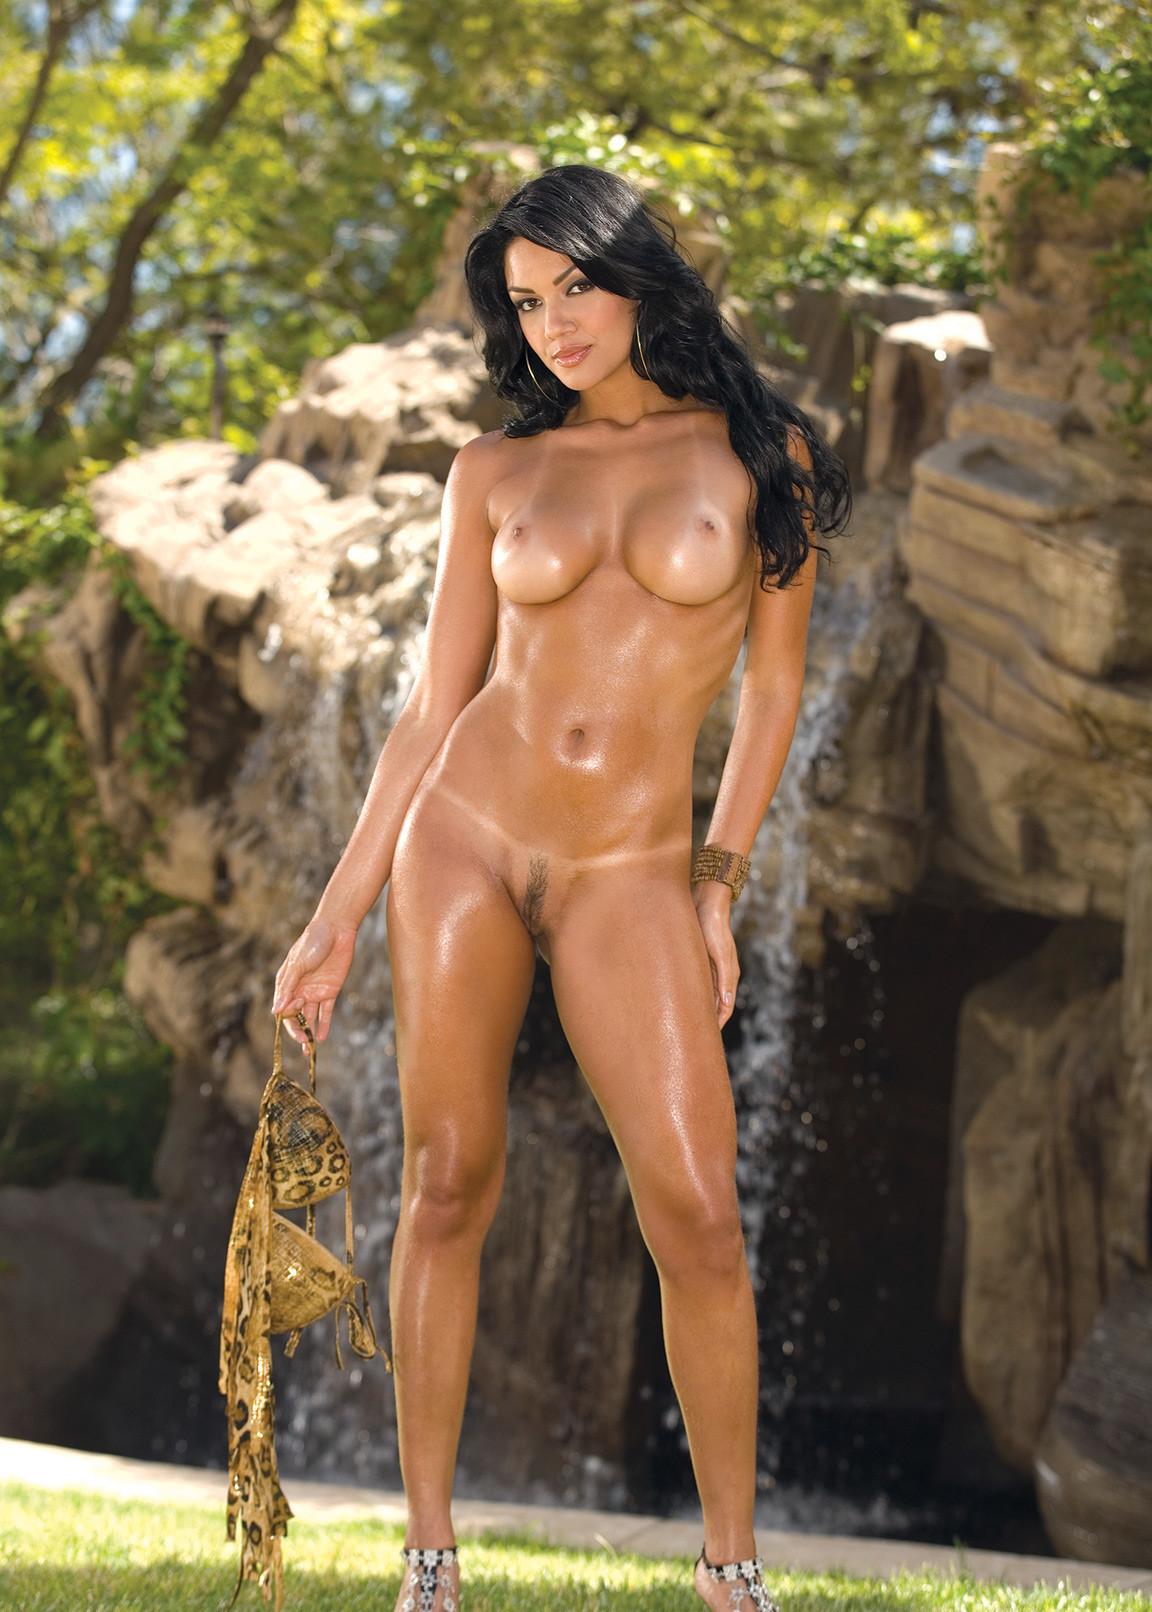 Sexy naked imvu girls pics naked scene